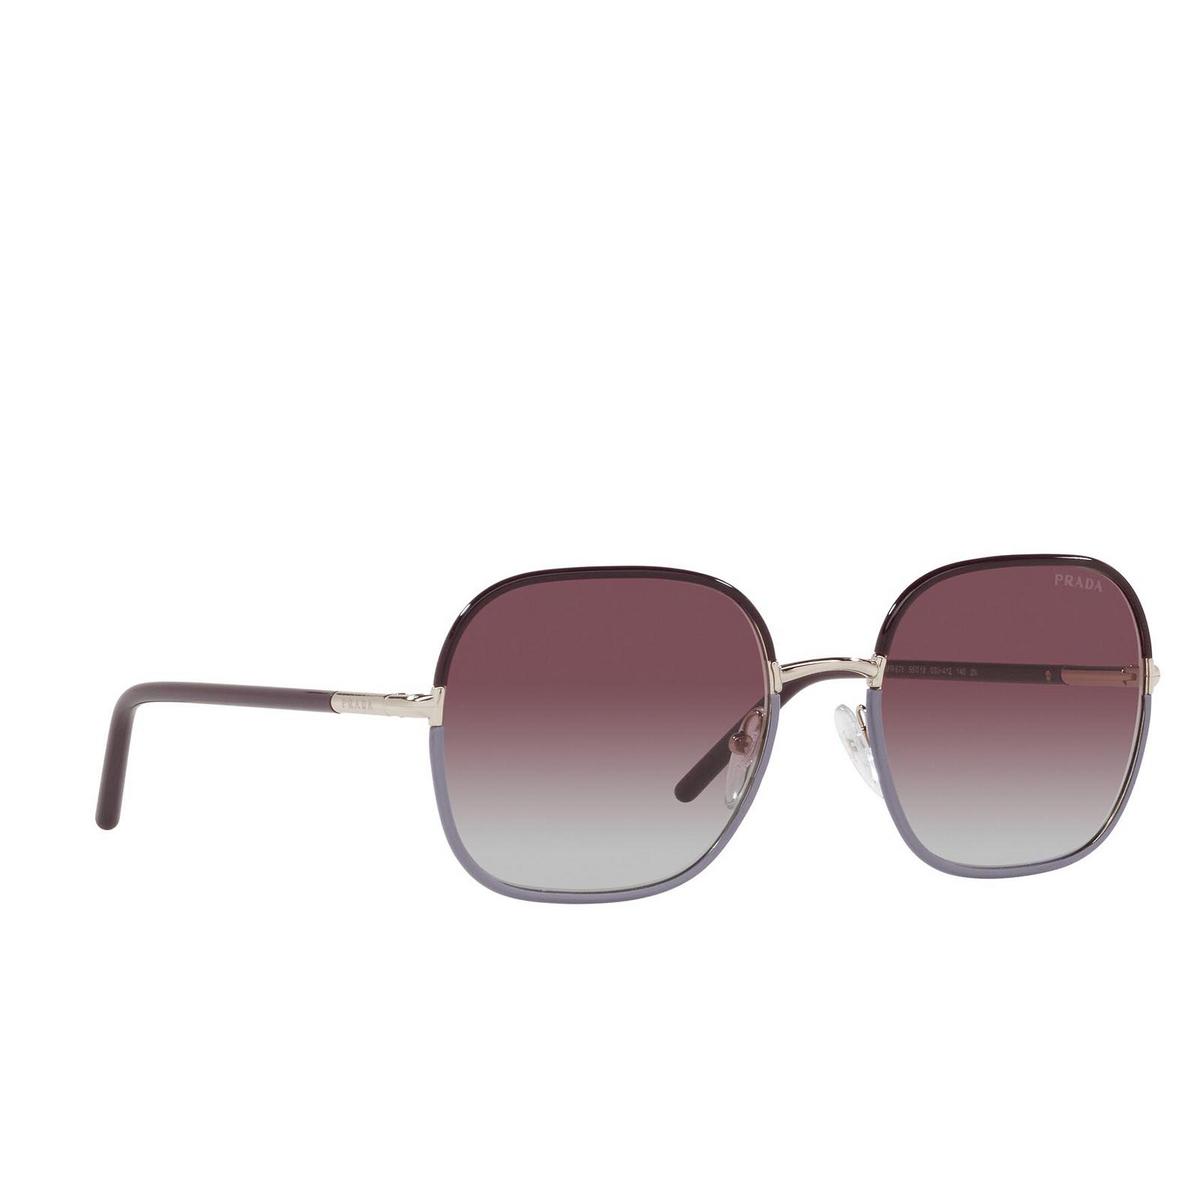 Prada® Square Sunglasses: PR 67XS color Plum / Wisteria 03U412.